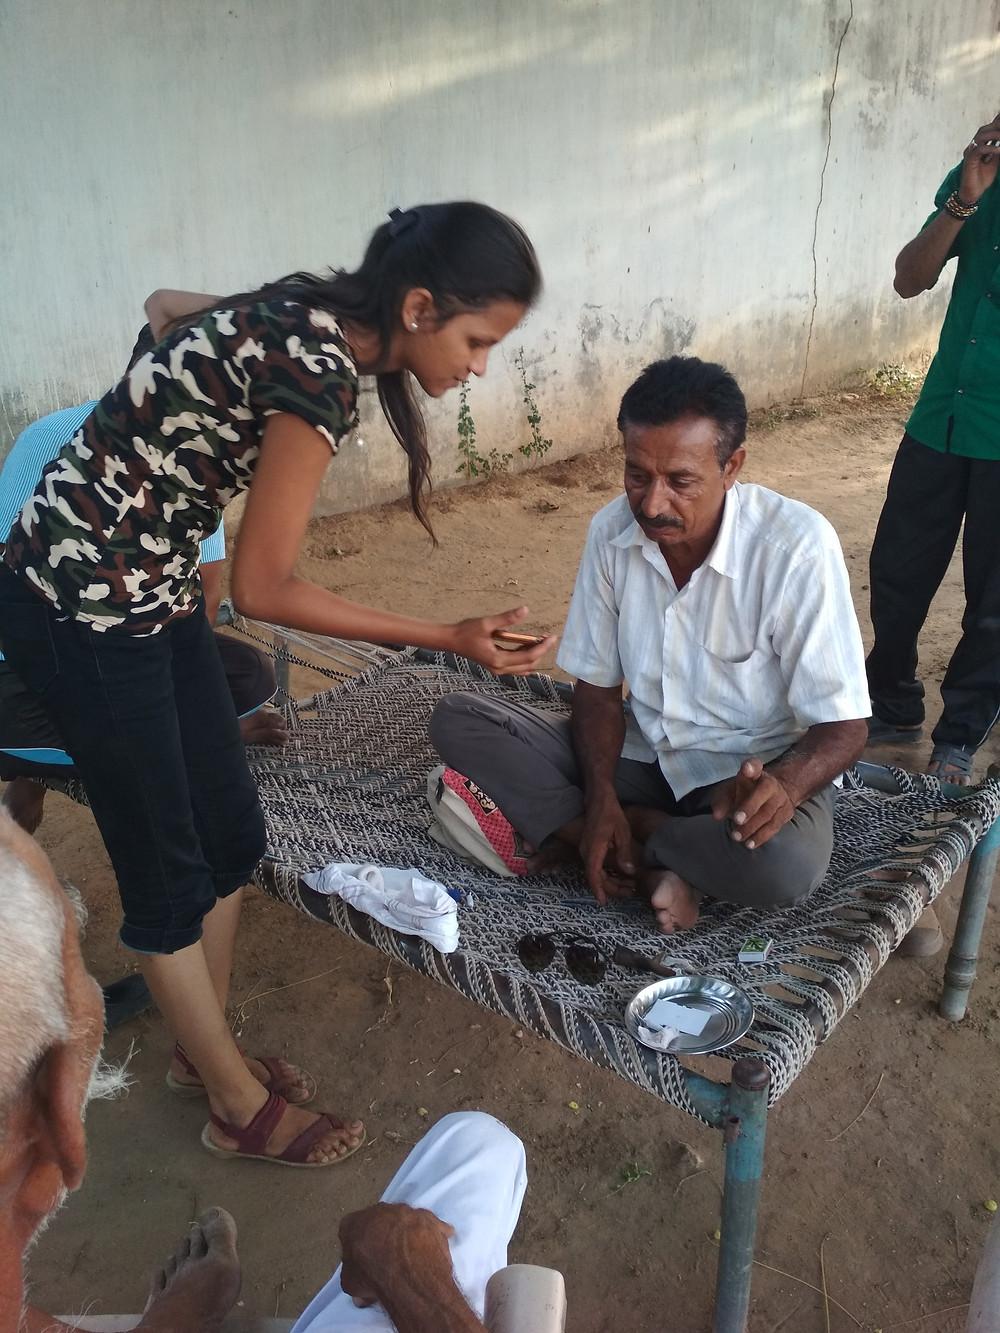 Vrushali showing electronic nilgai detection method to farmer